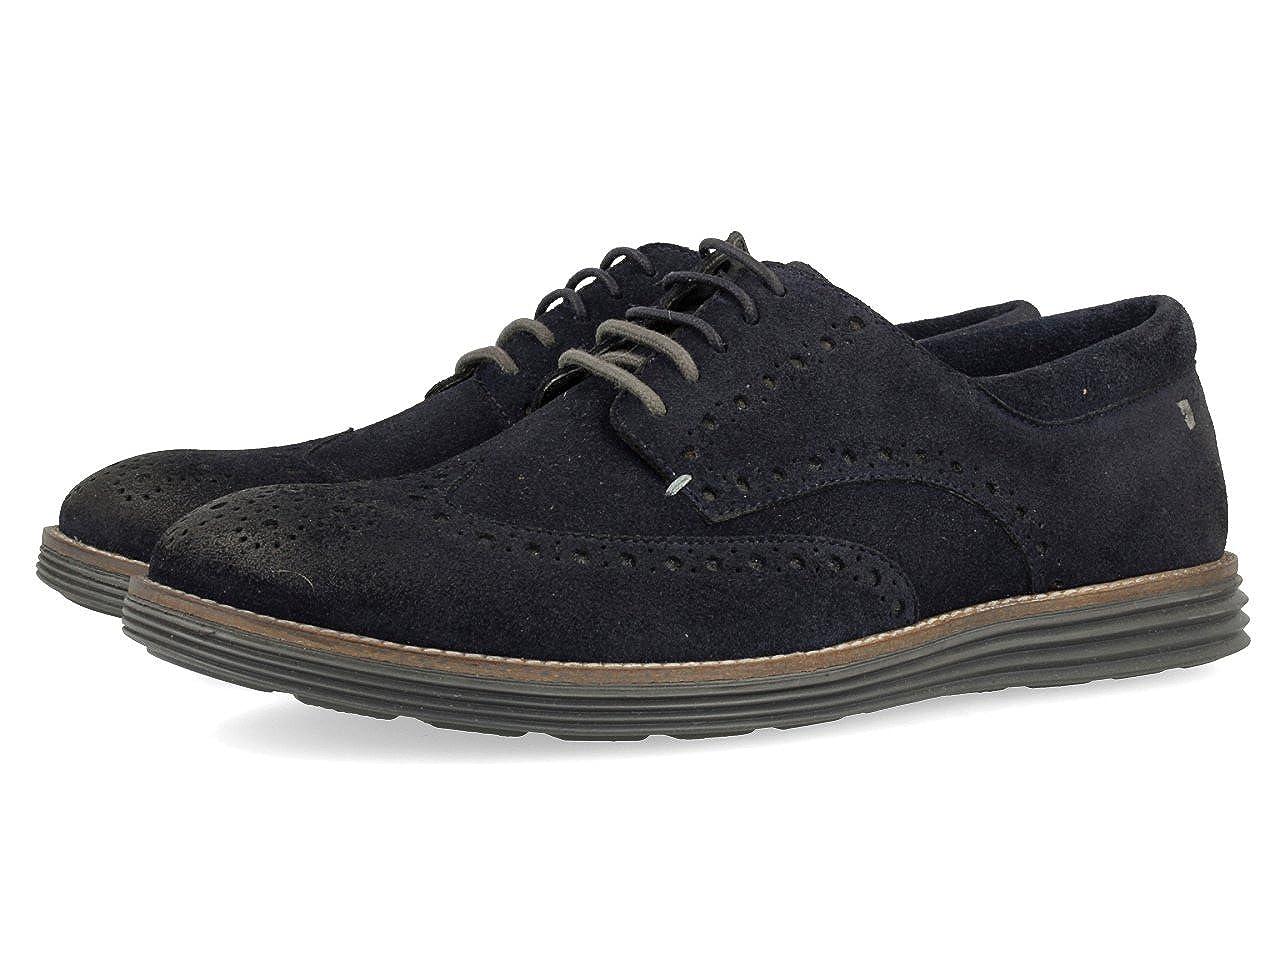 GIOSEPPO 30679, Zapatos de Cordones Brogue para Hombre